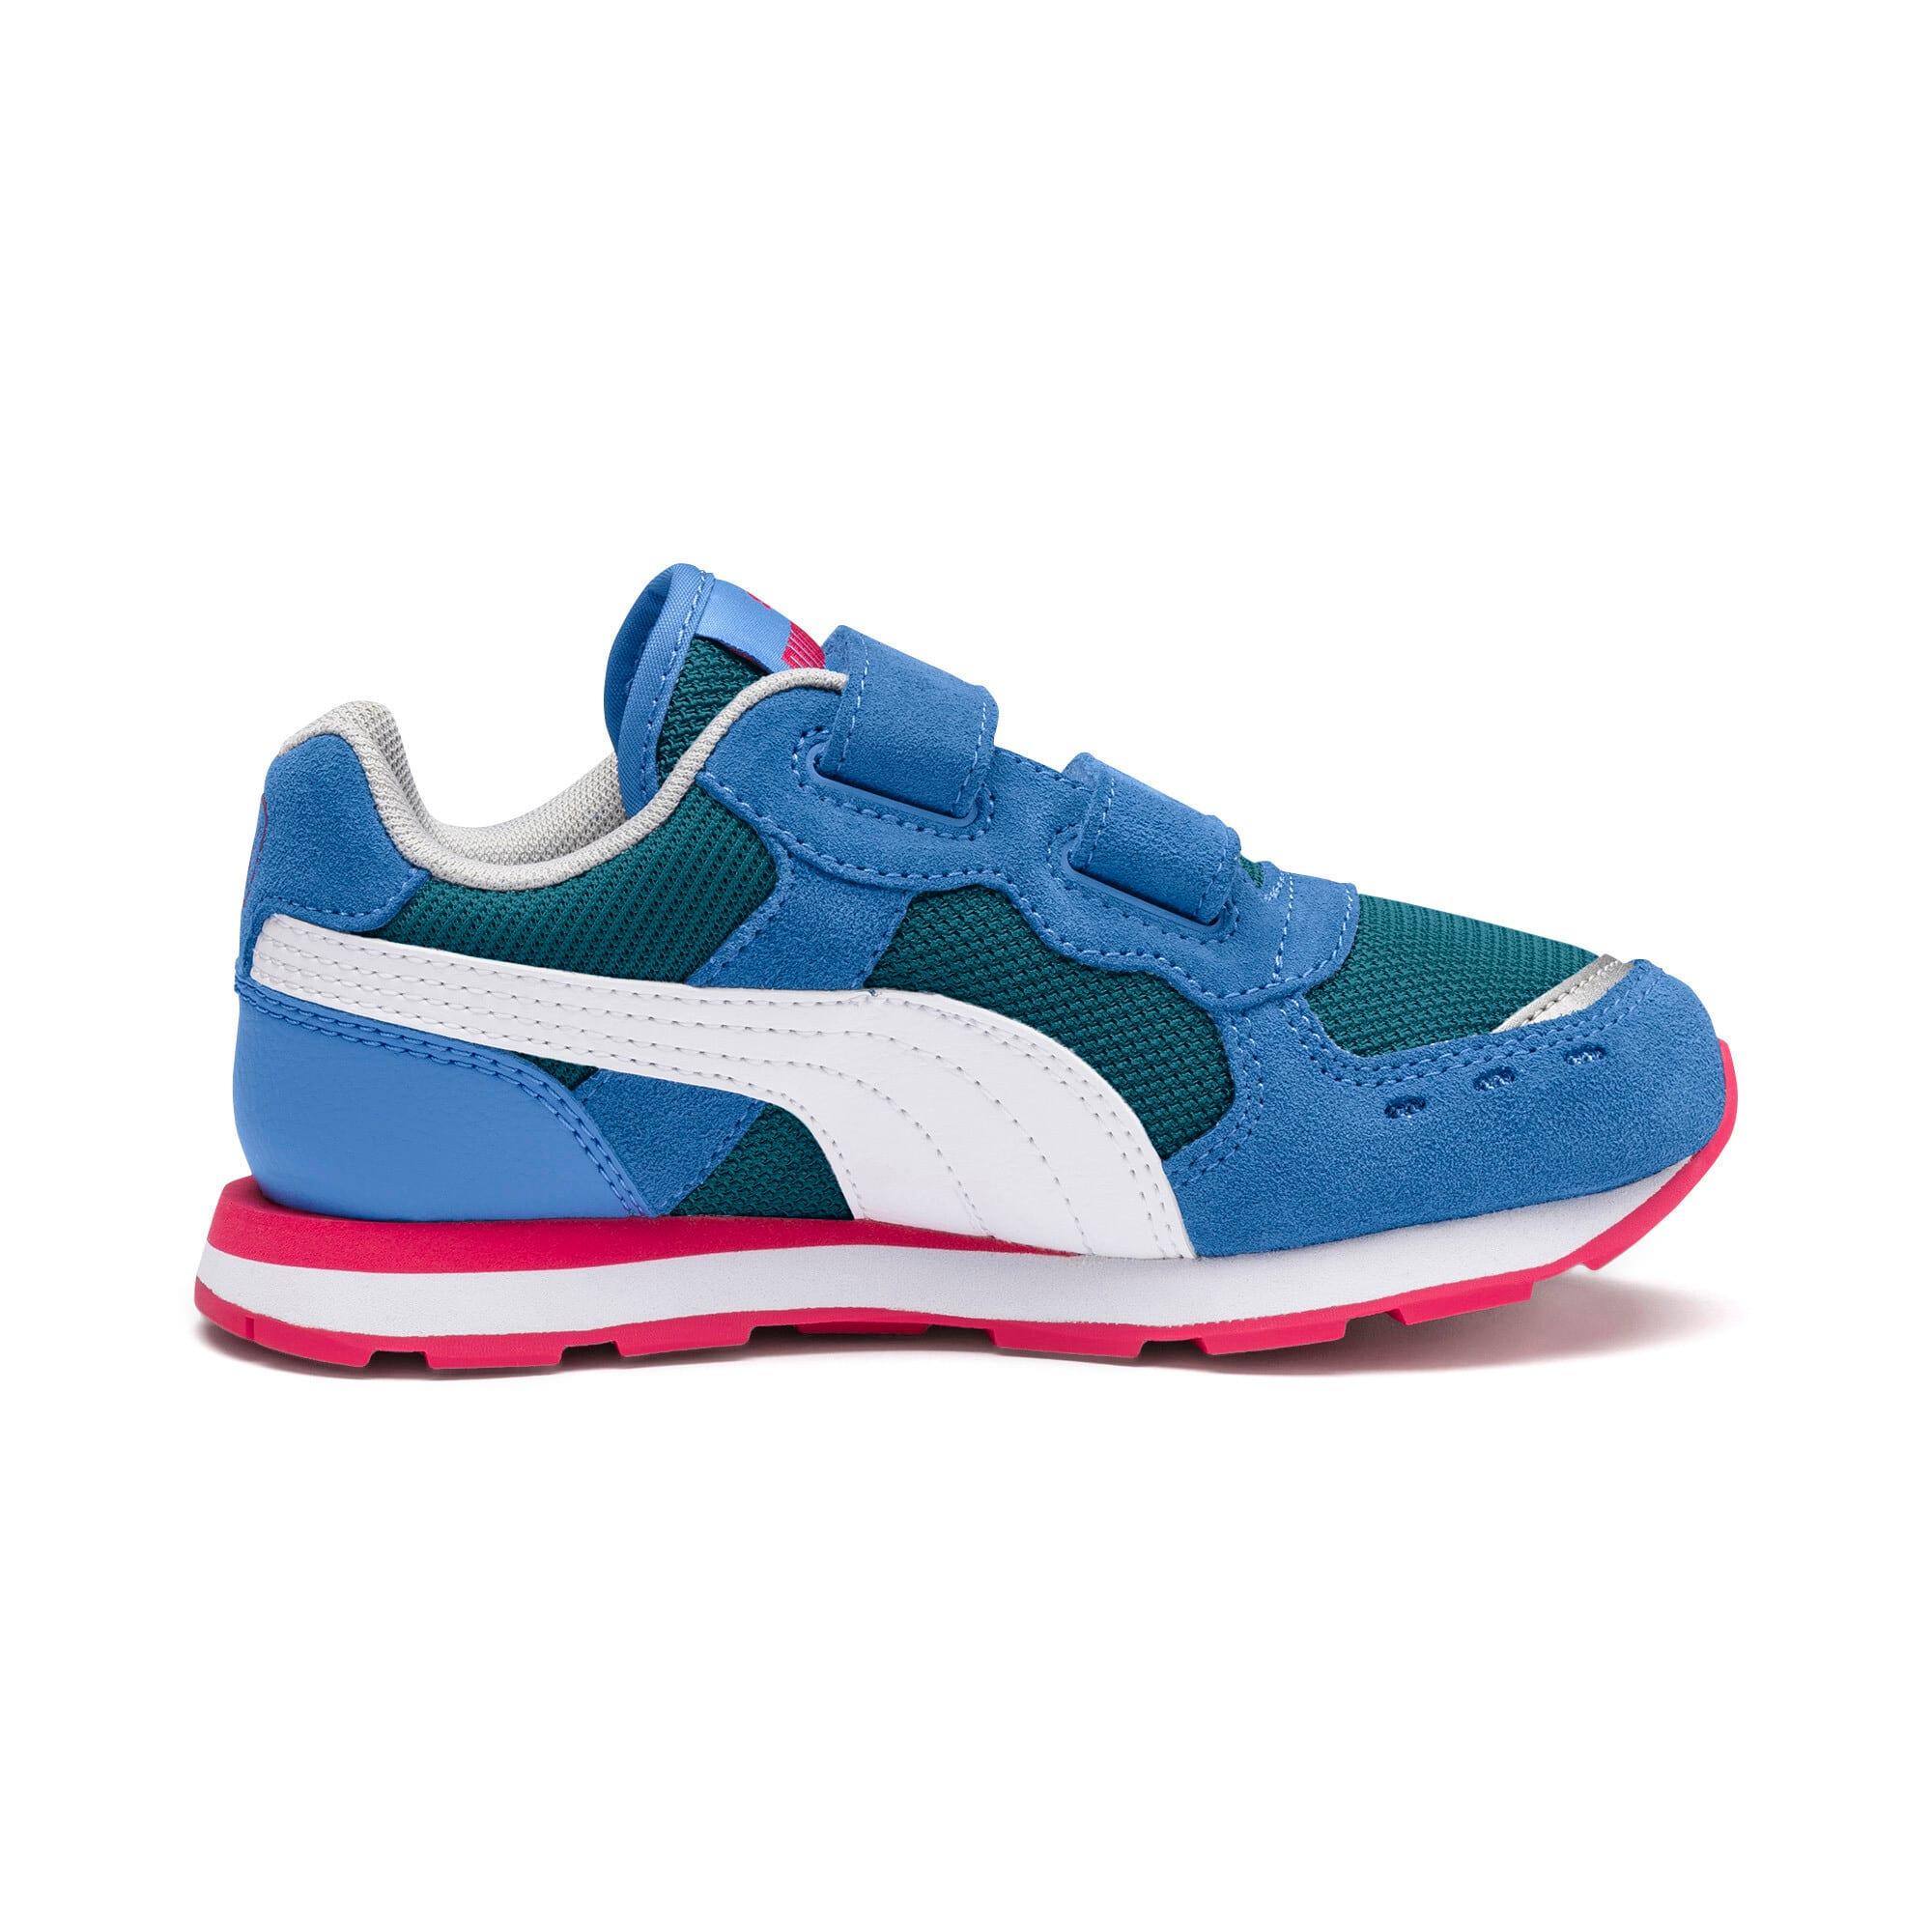 Miniatura 4 de Zapatos Vista para niños, Ultramarine-Puma White, mediano